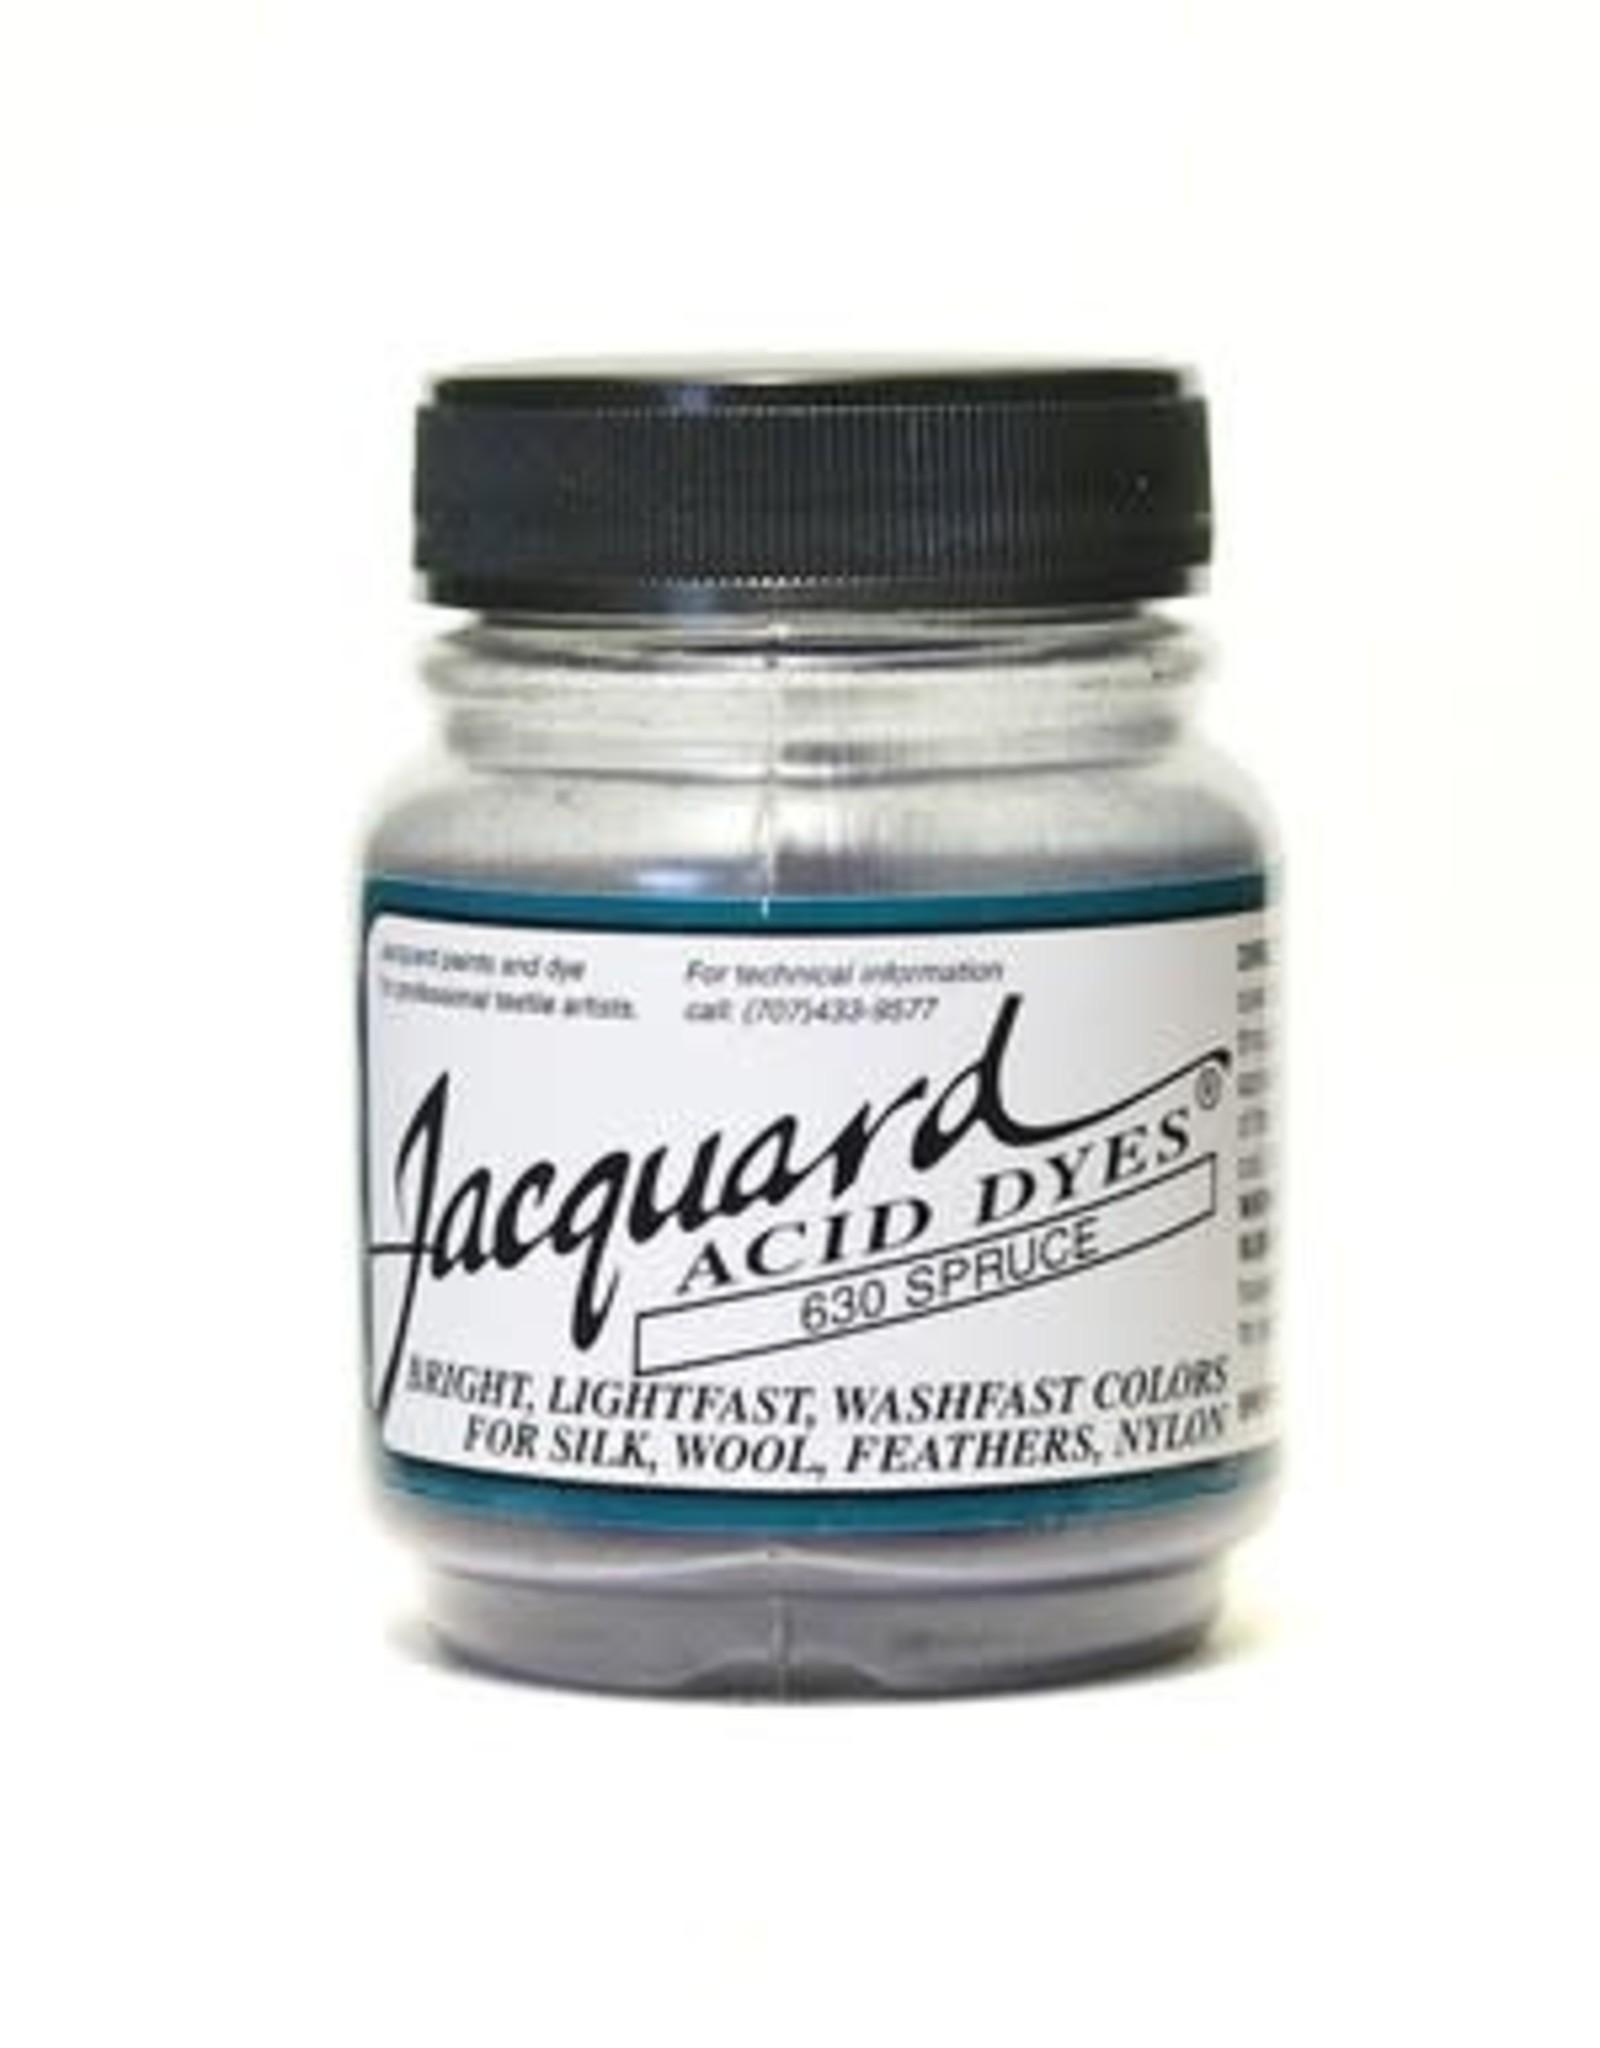 Jacquard Jacquard Acid Dye Spruce